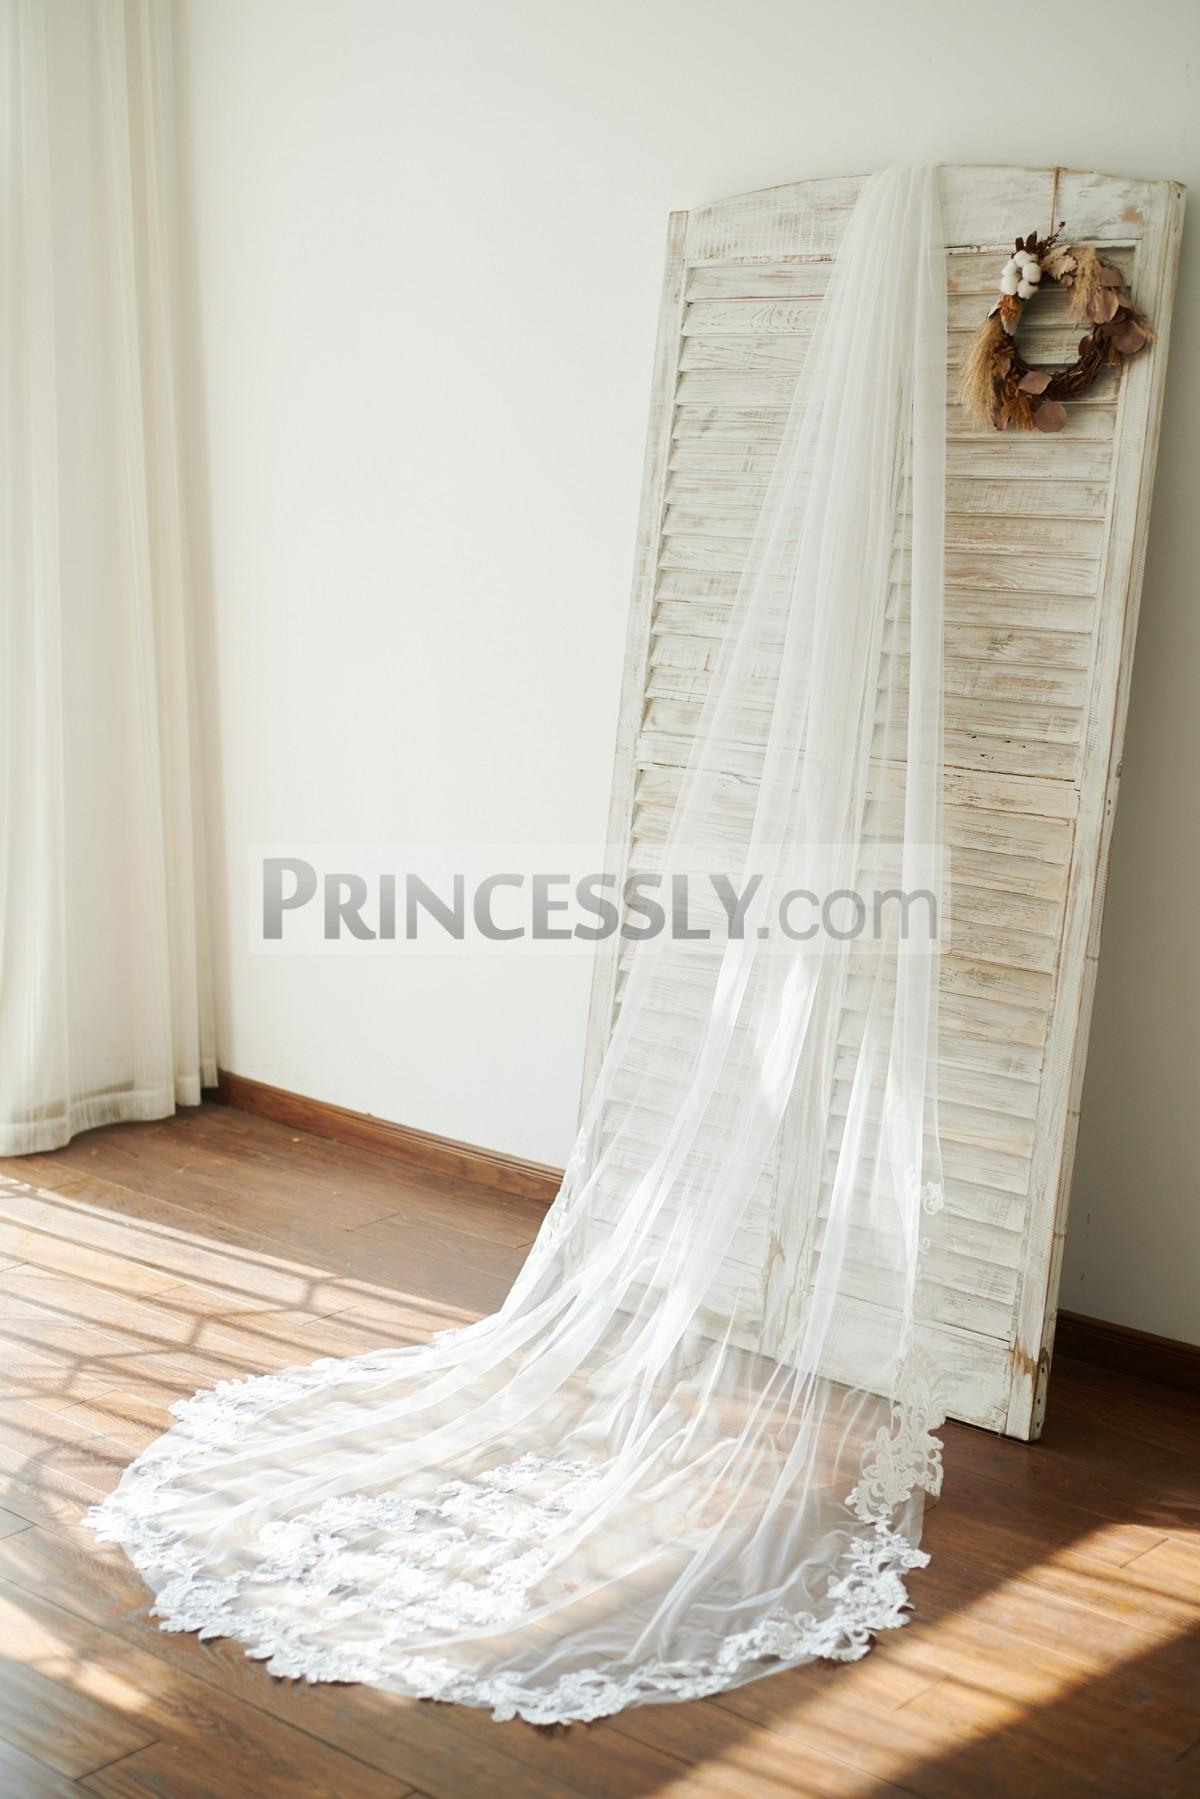 Princessly.com-K1003860-Cathedral Long Tulle Lace Appliques Wedding Veil Bridal Veil-31